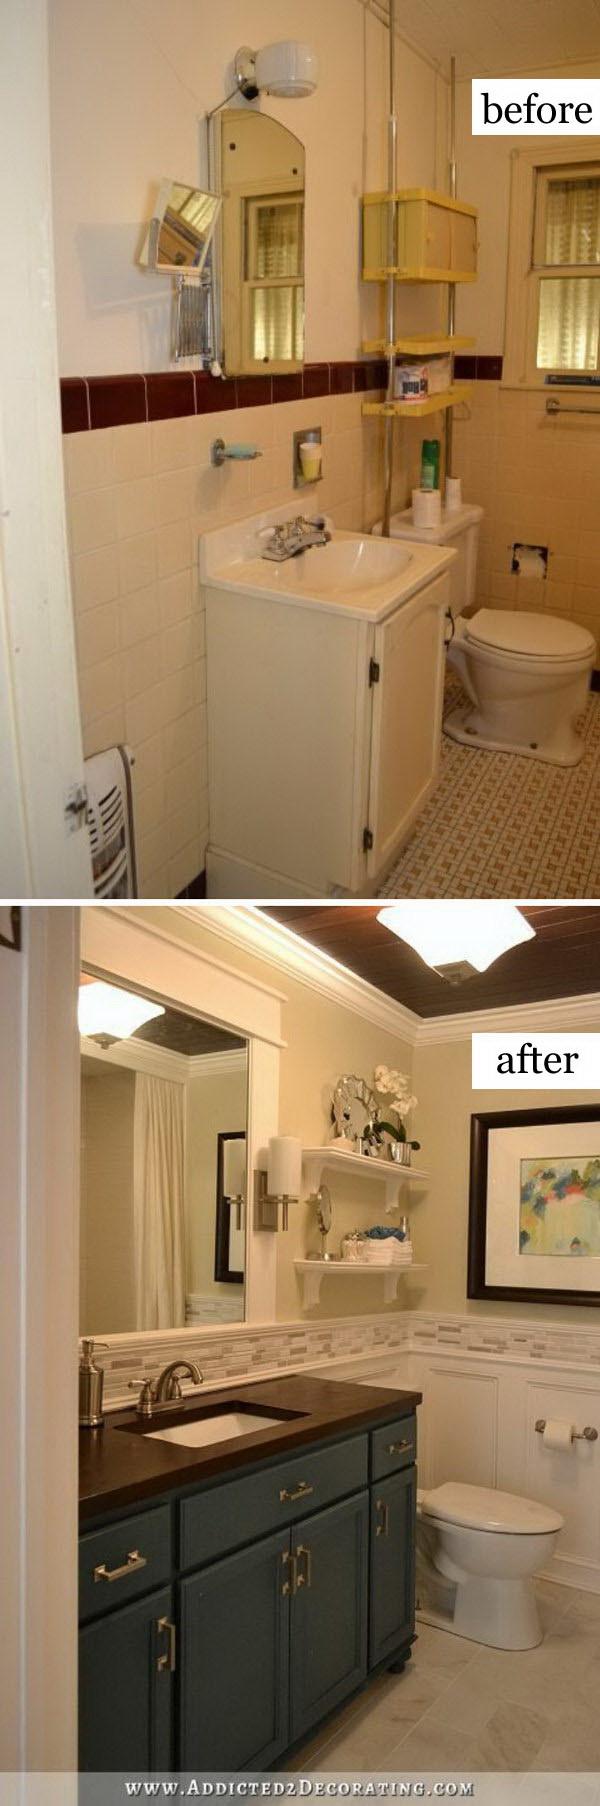 Hallway Bathroom Remodel: Before & After .